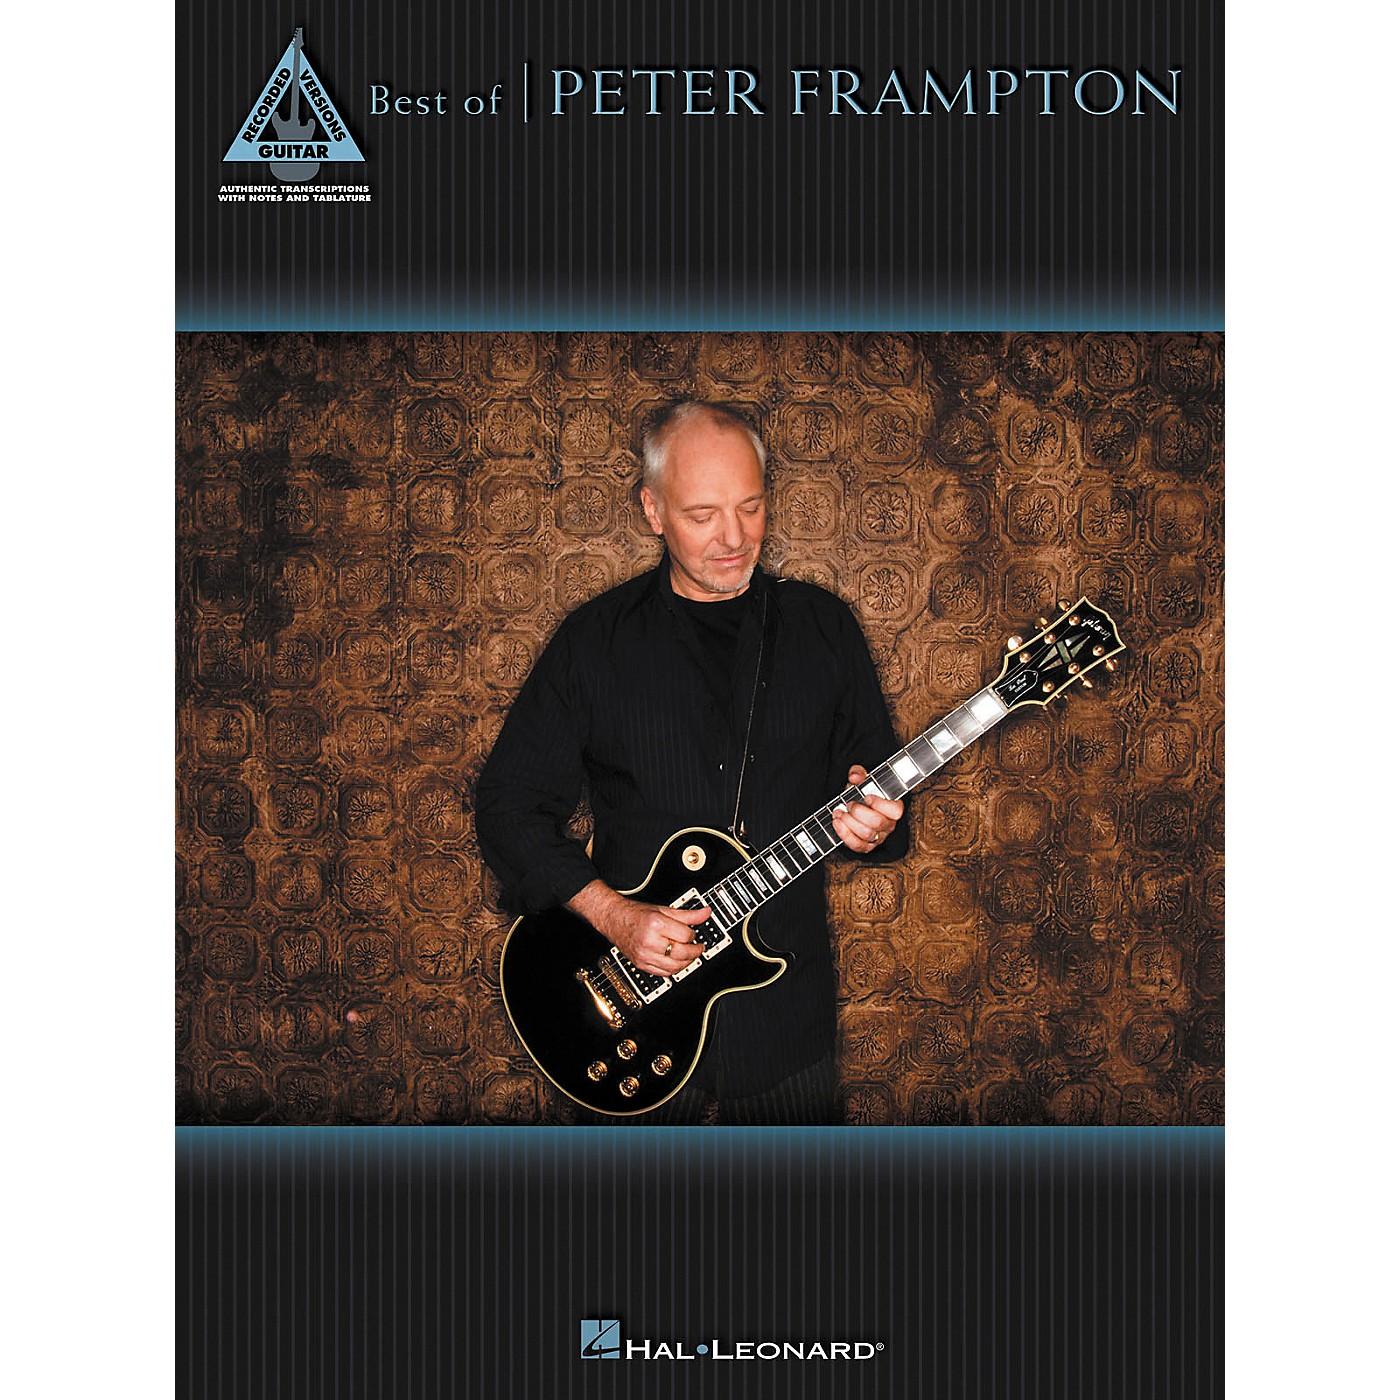 Hal Leonard Best Of Peter Frampton Guitar Tab Songbook thumbnail